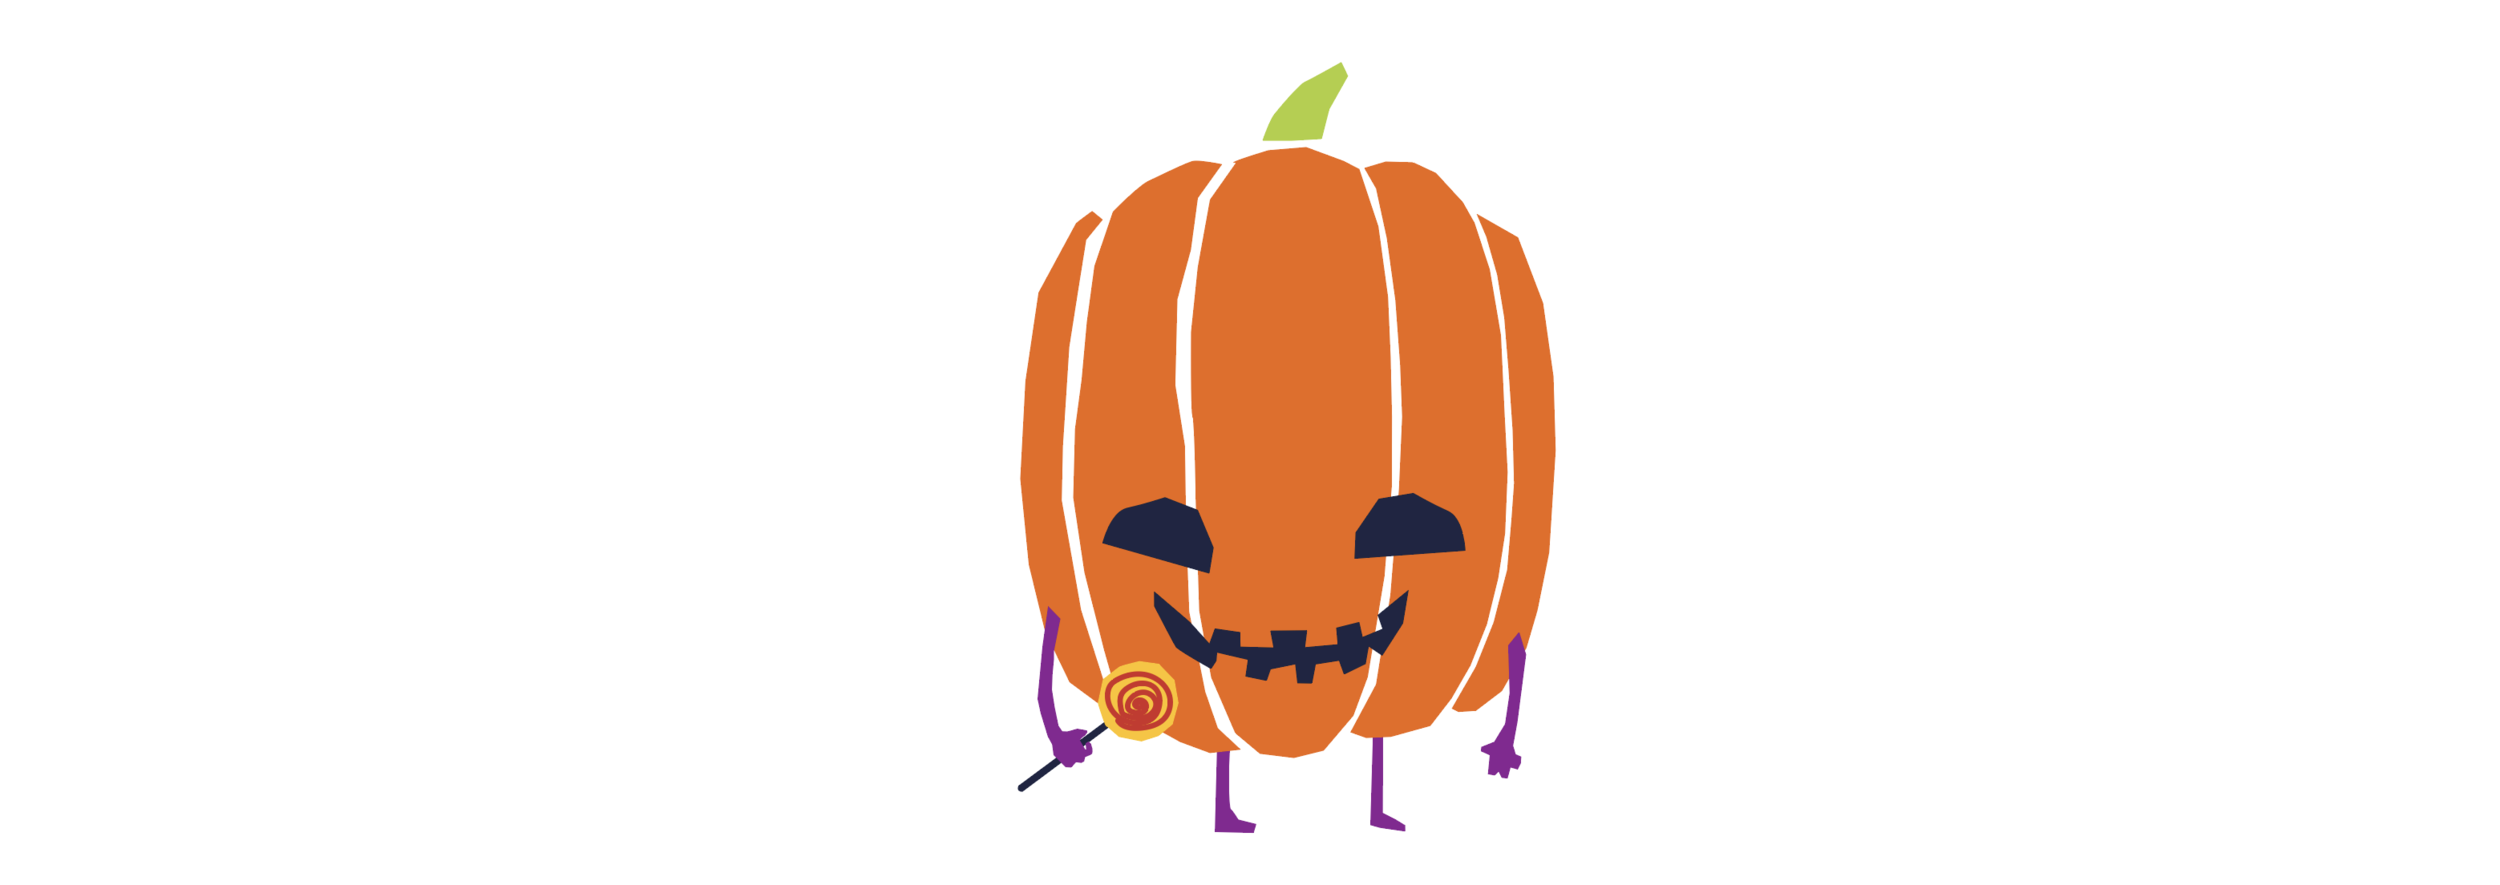 Jack-o-lantern holding a lollipop